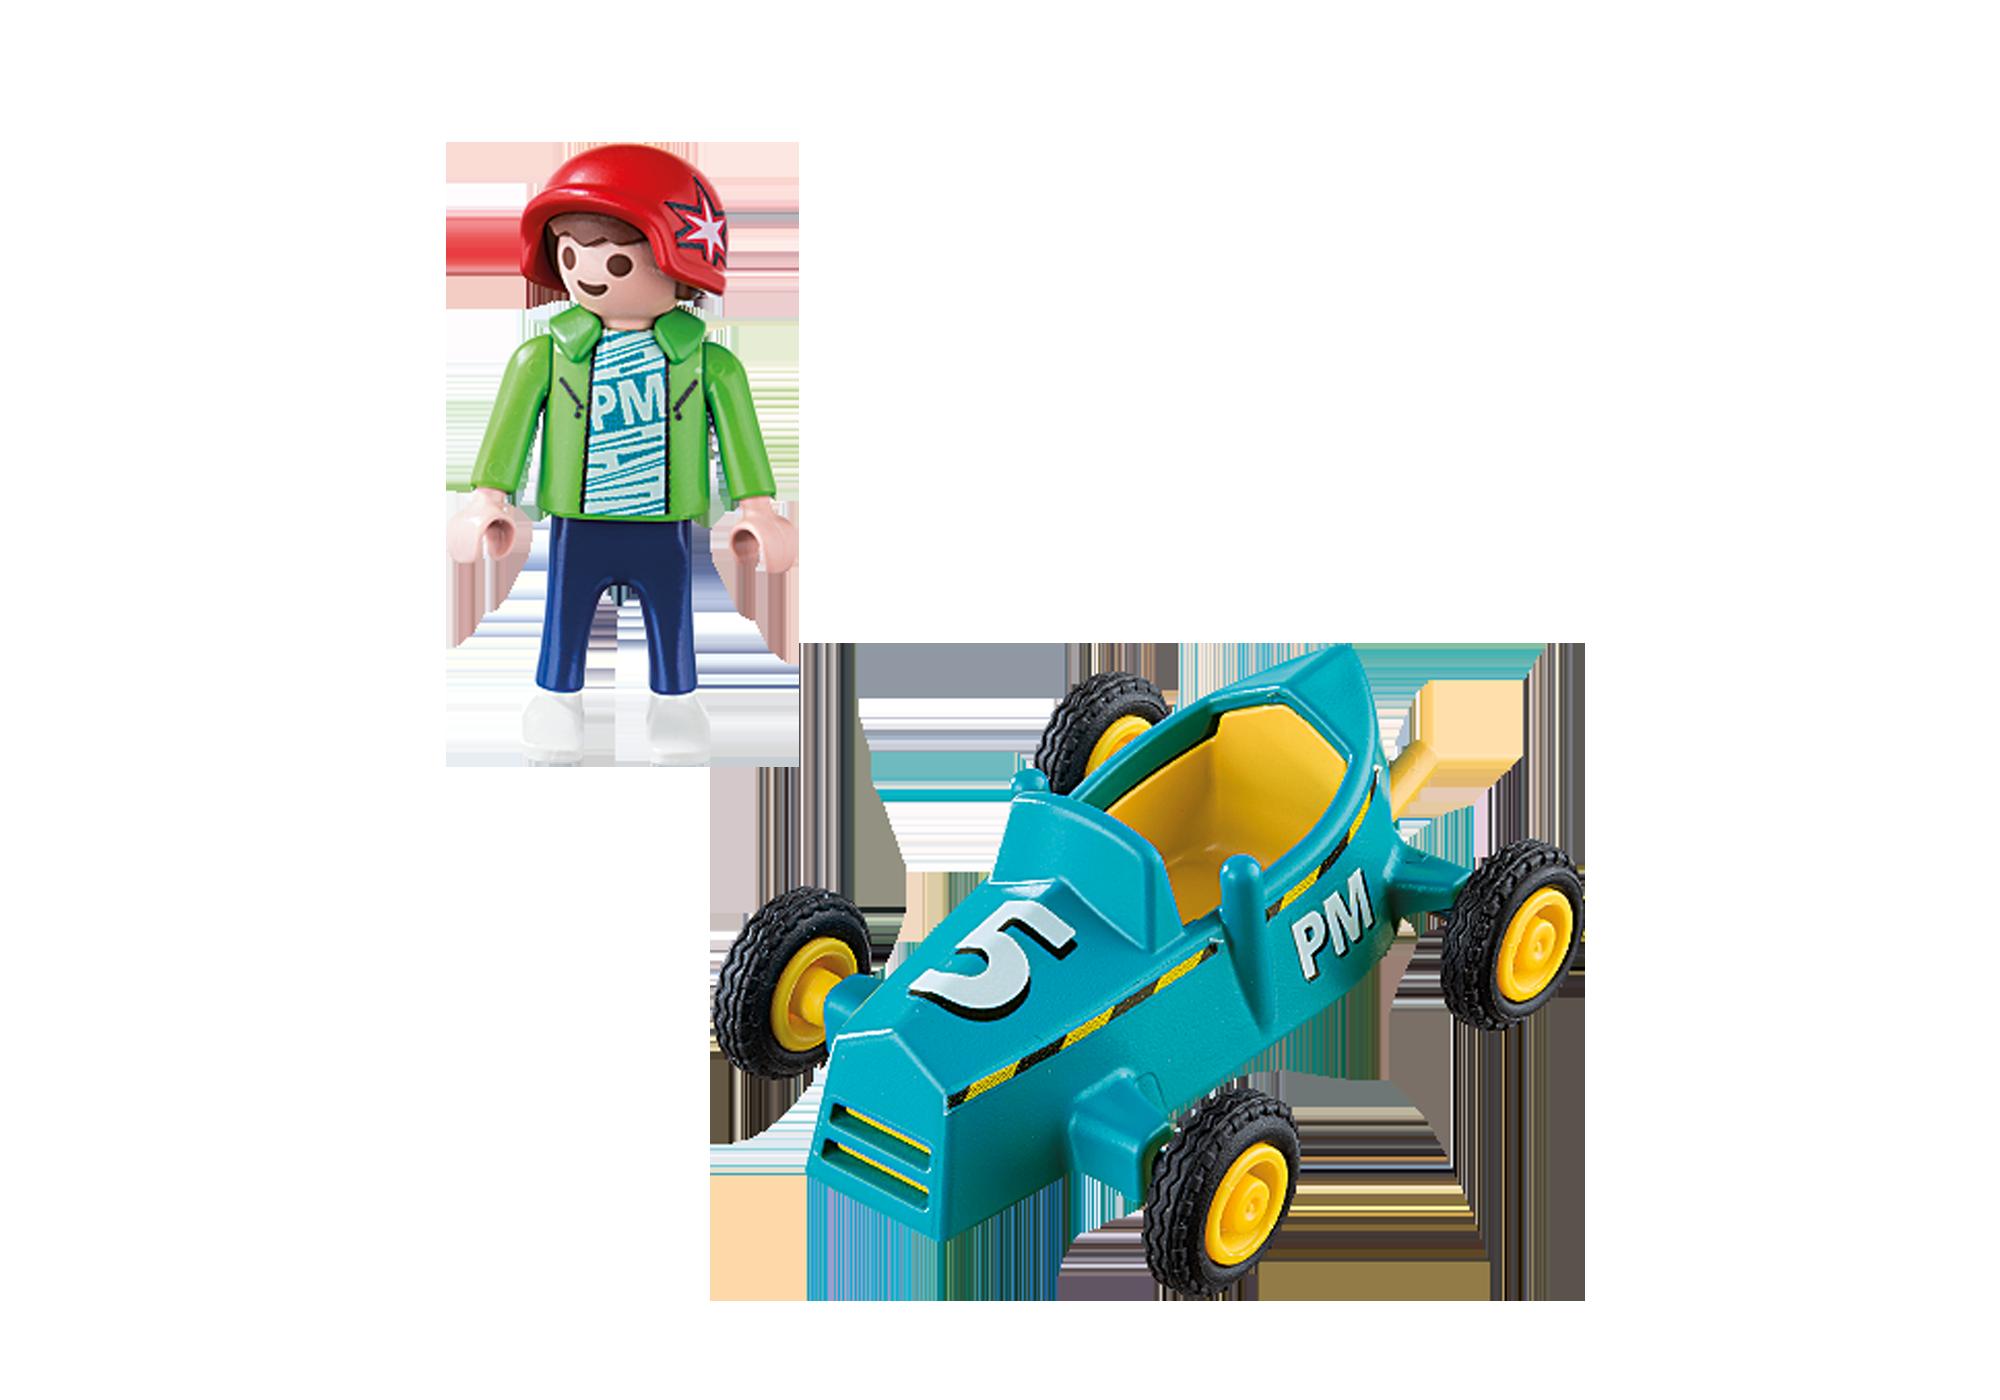 Playmobil Enfant avec kart